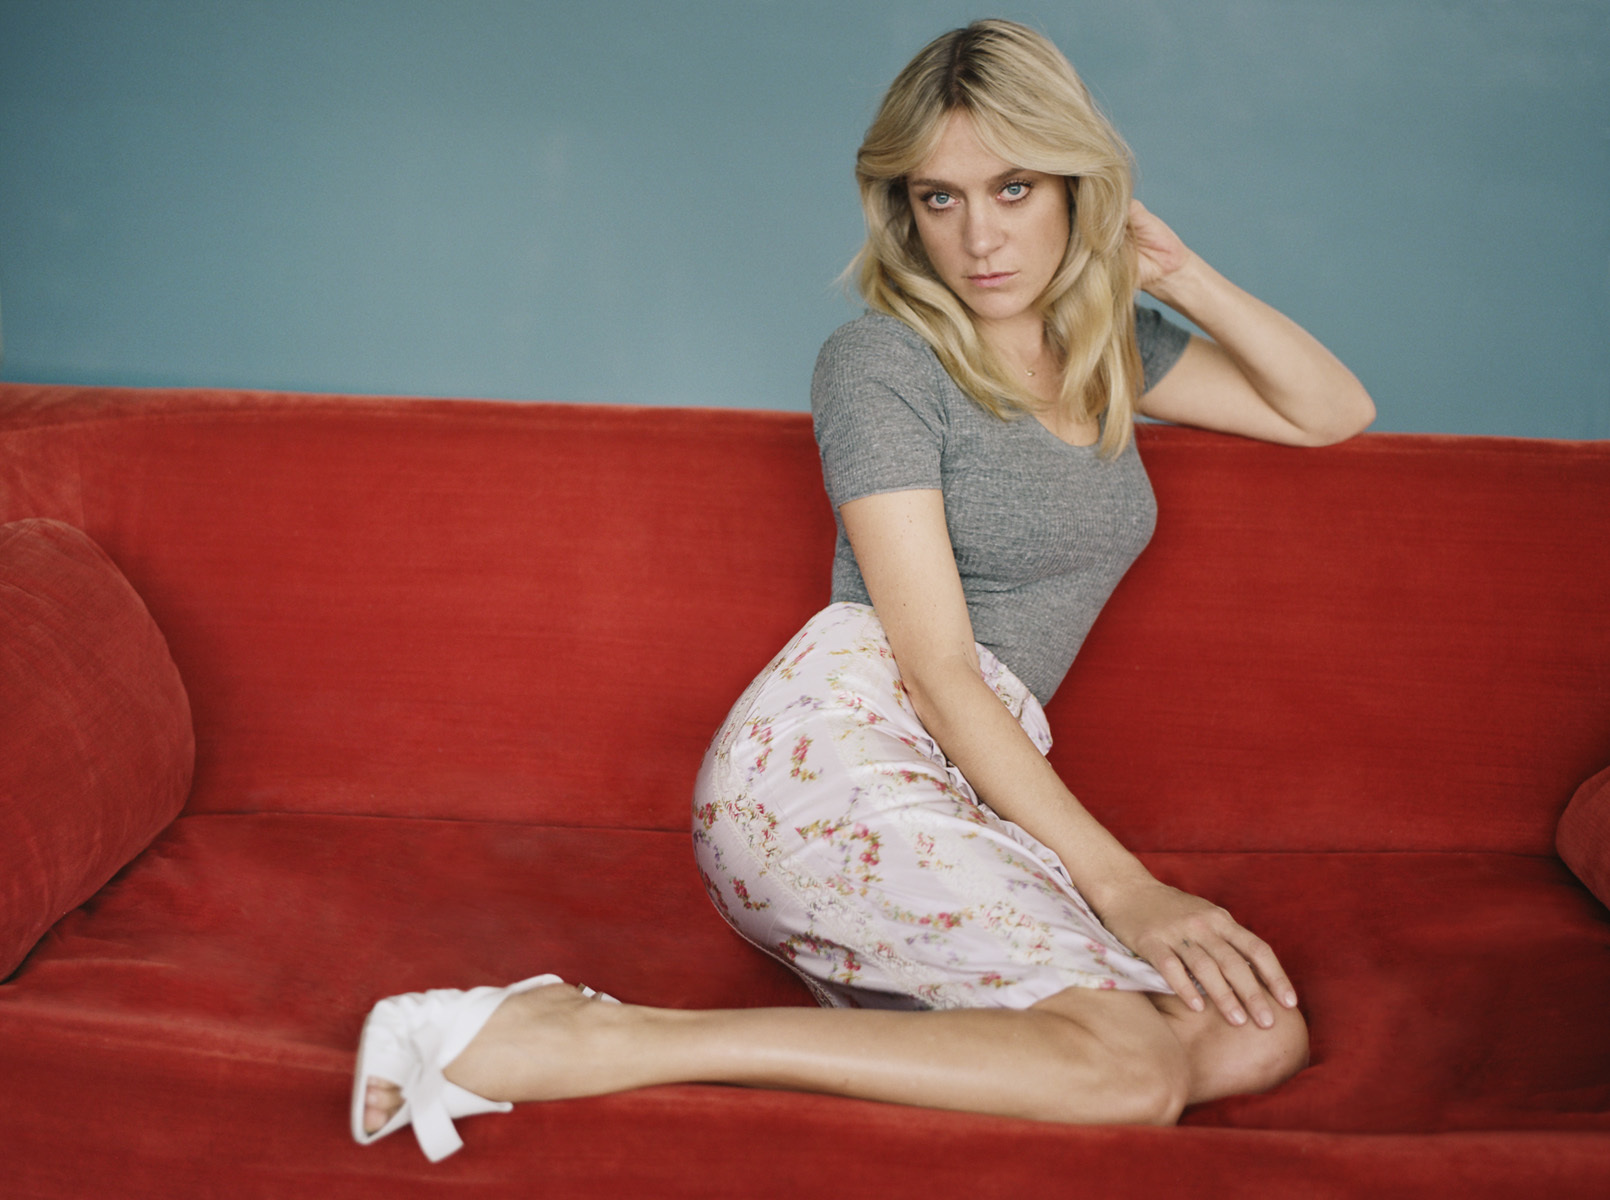 Chloe Sevigny - Thomas Whiteside - www.nataliebrewster.com